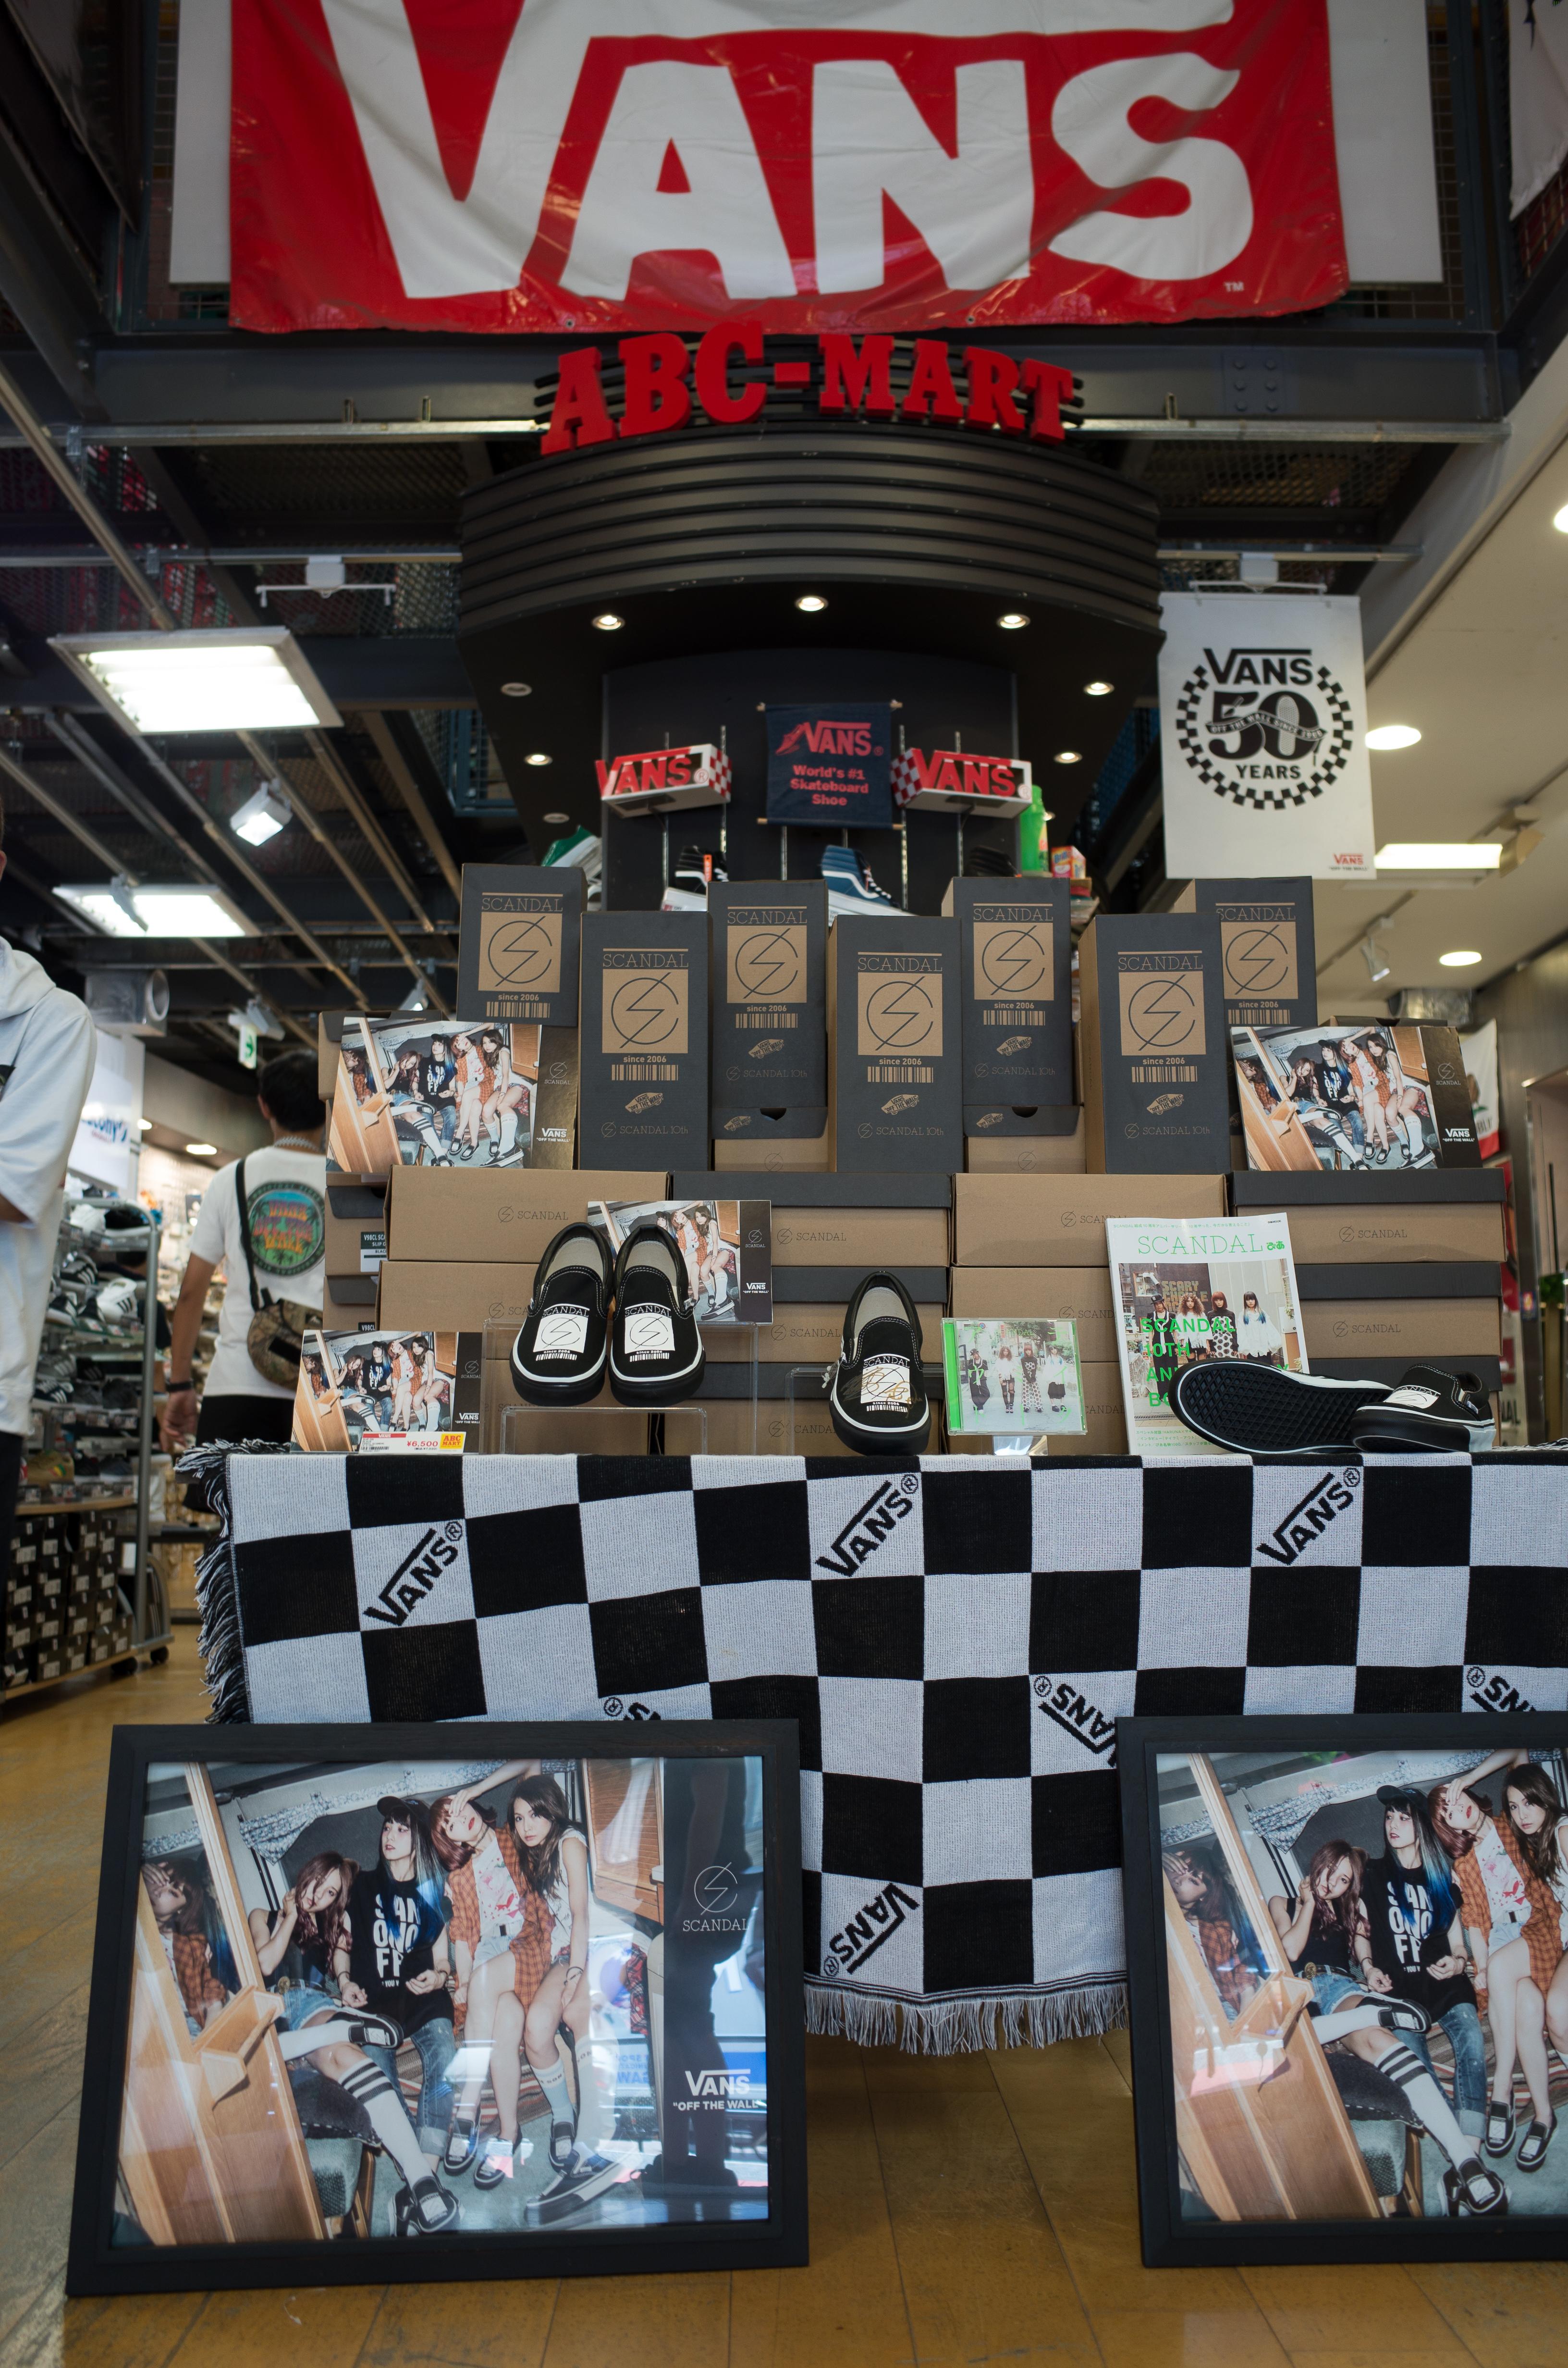 Vans Shoe Store Denver Colorado